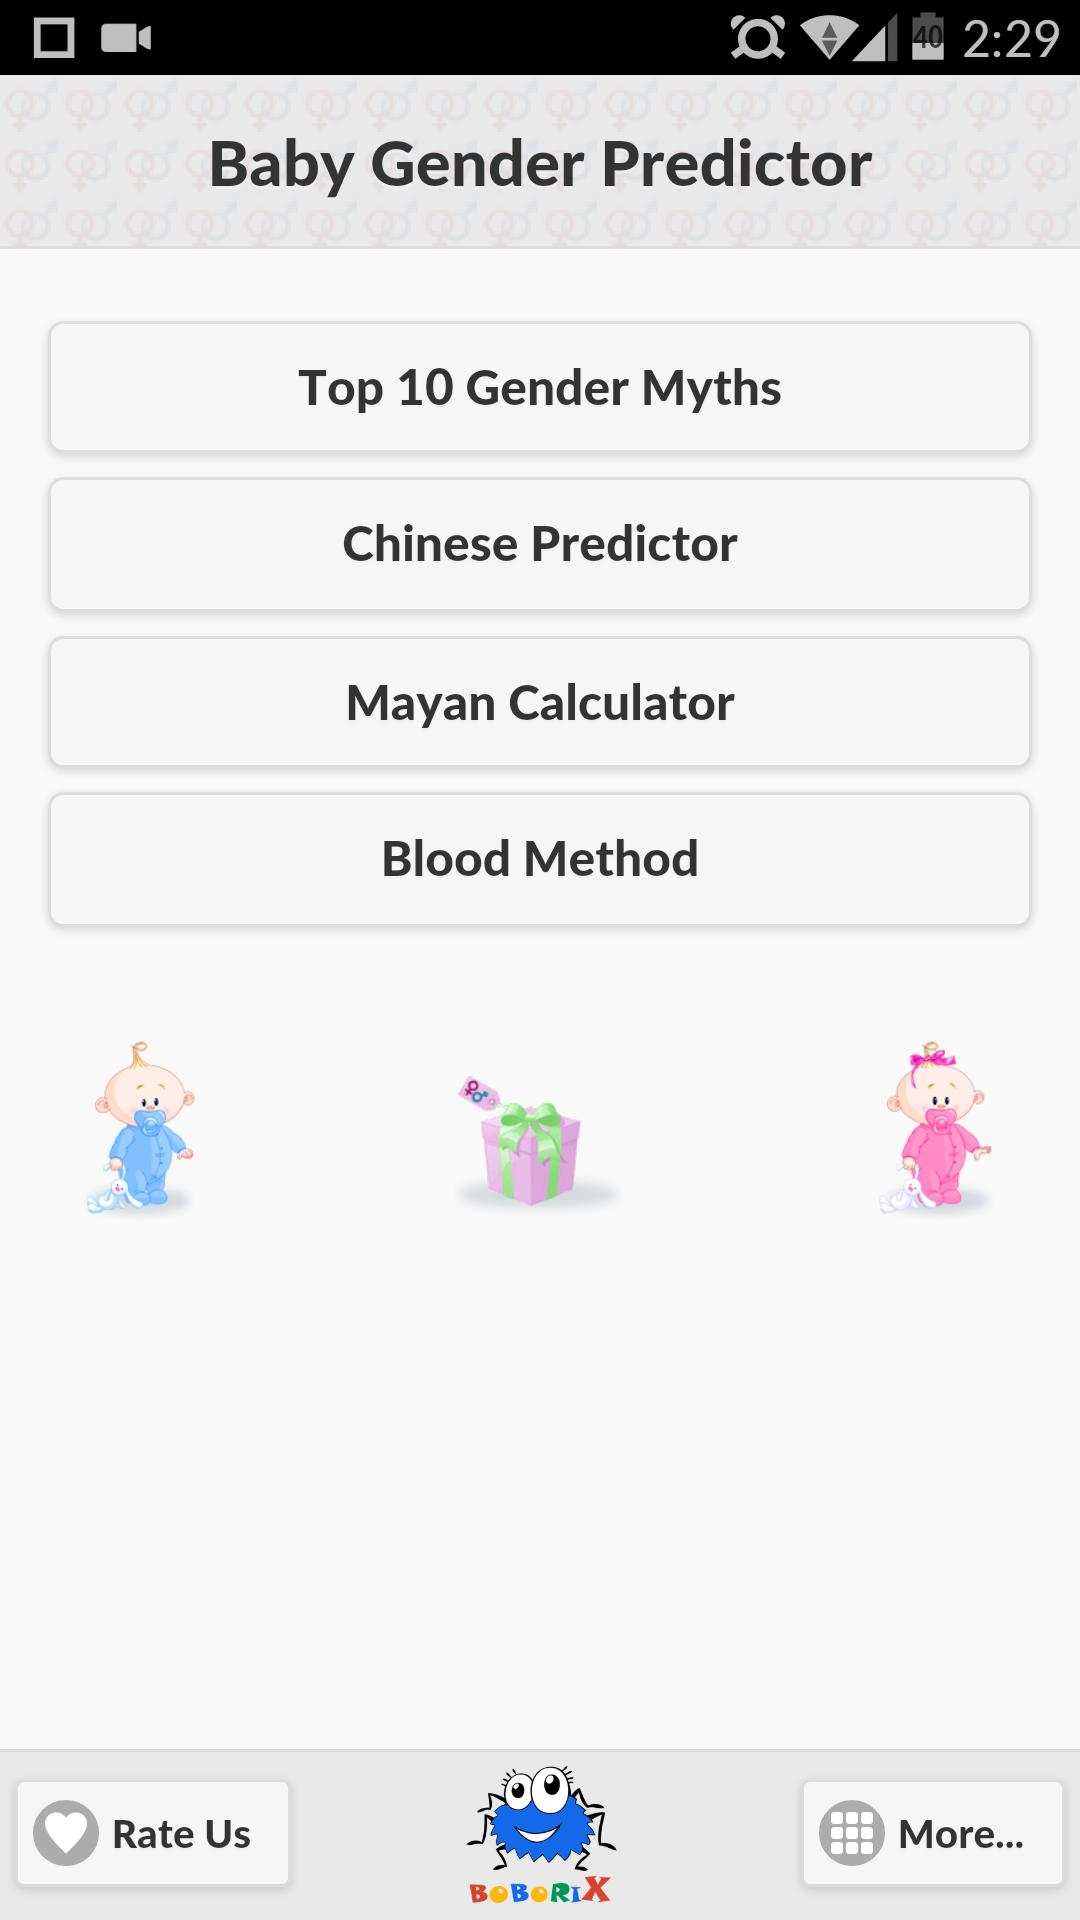 Baby Gender Predictor For Android  Apk Download regarding Mayan Gender Predictor